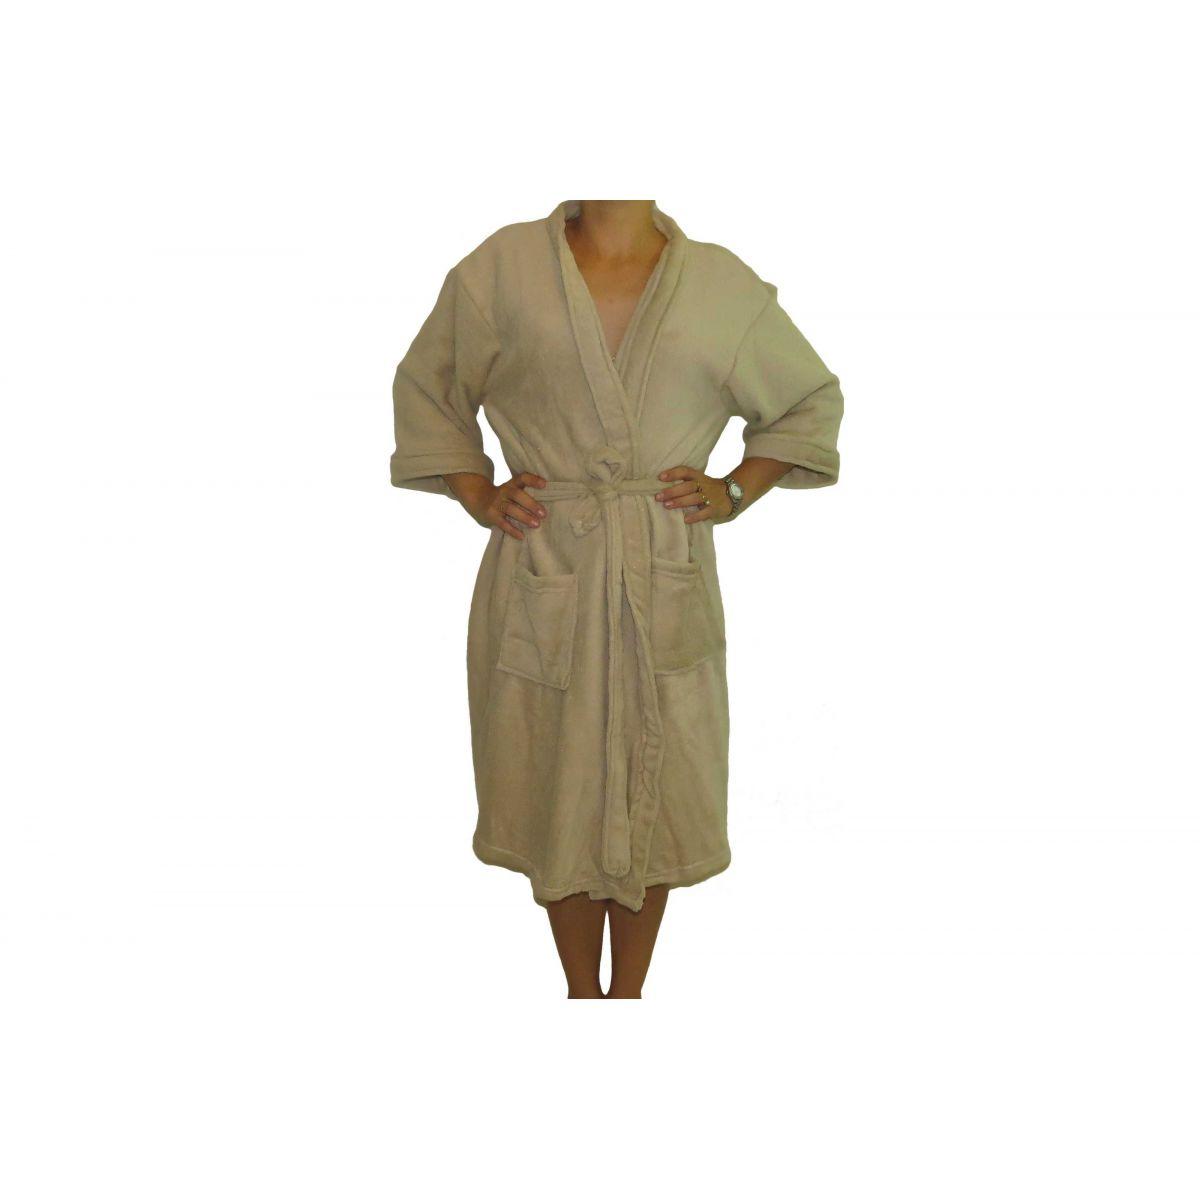 Roupão Microfibra Sofisticata Kimono Cru GG Atlântica